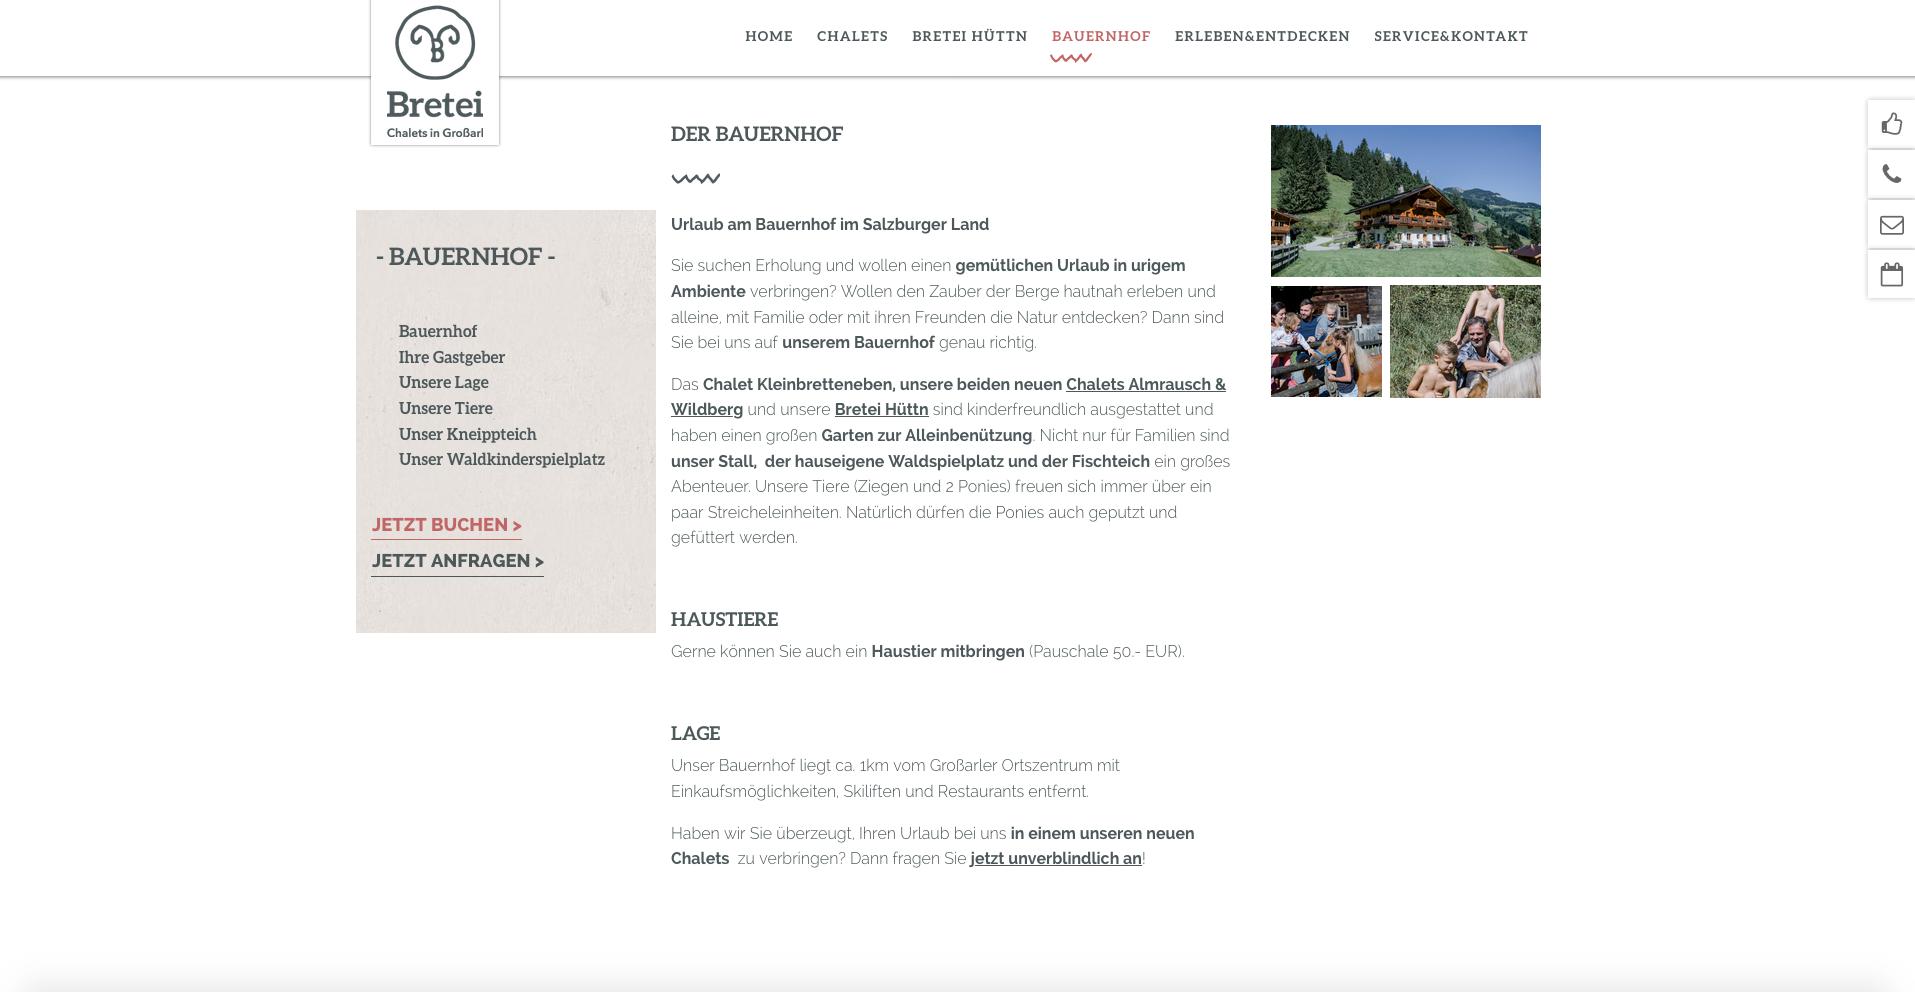 Fresh Herbs Communications Marketing Projektmanagement Website Salzburg_54_Bretei